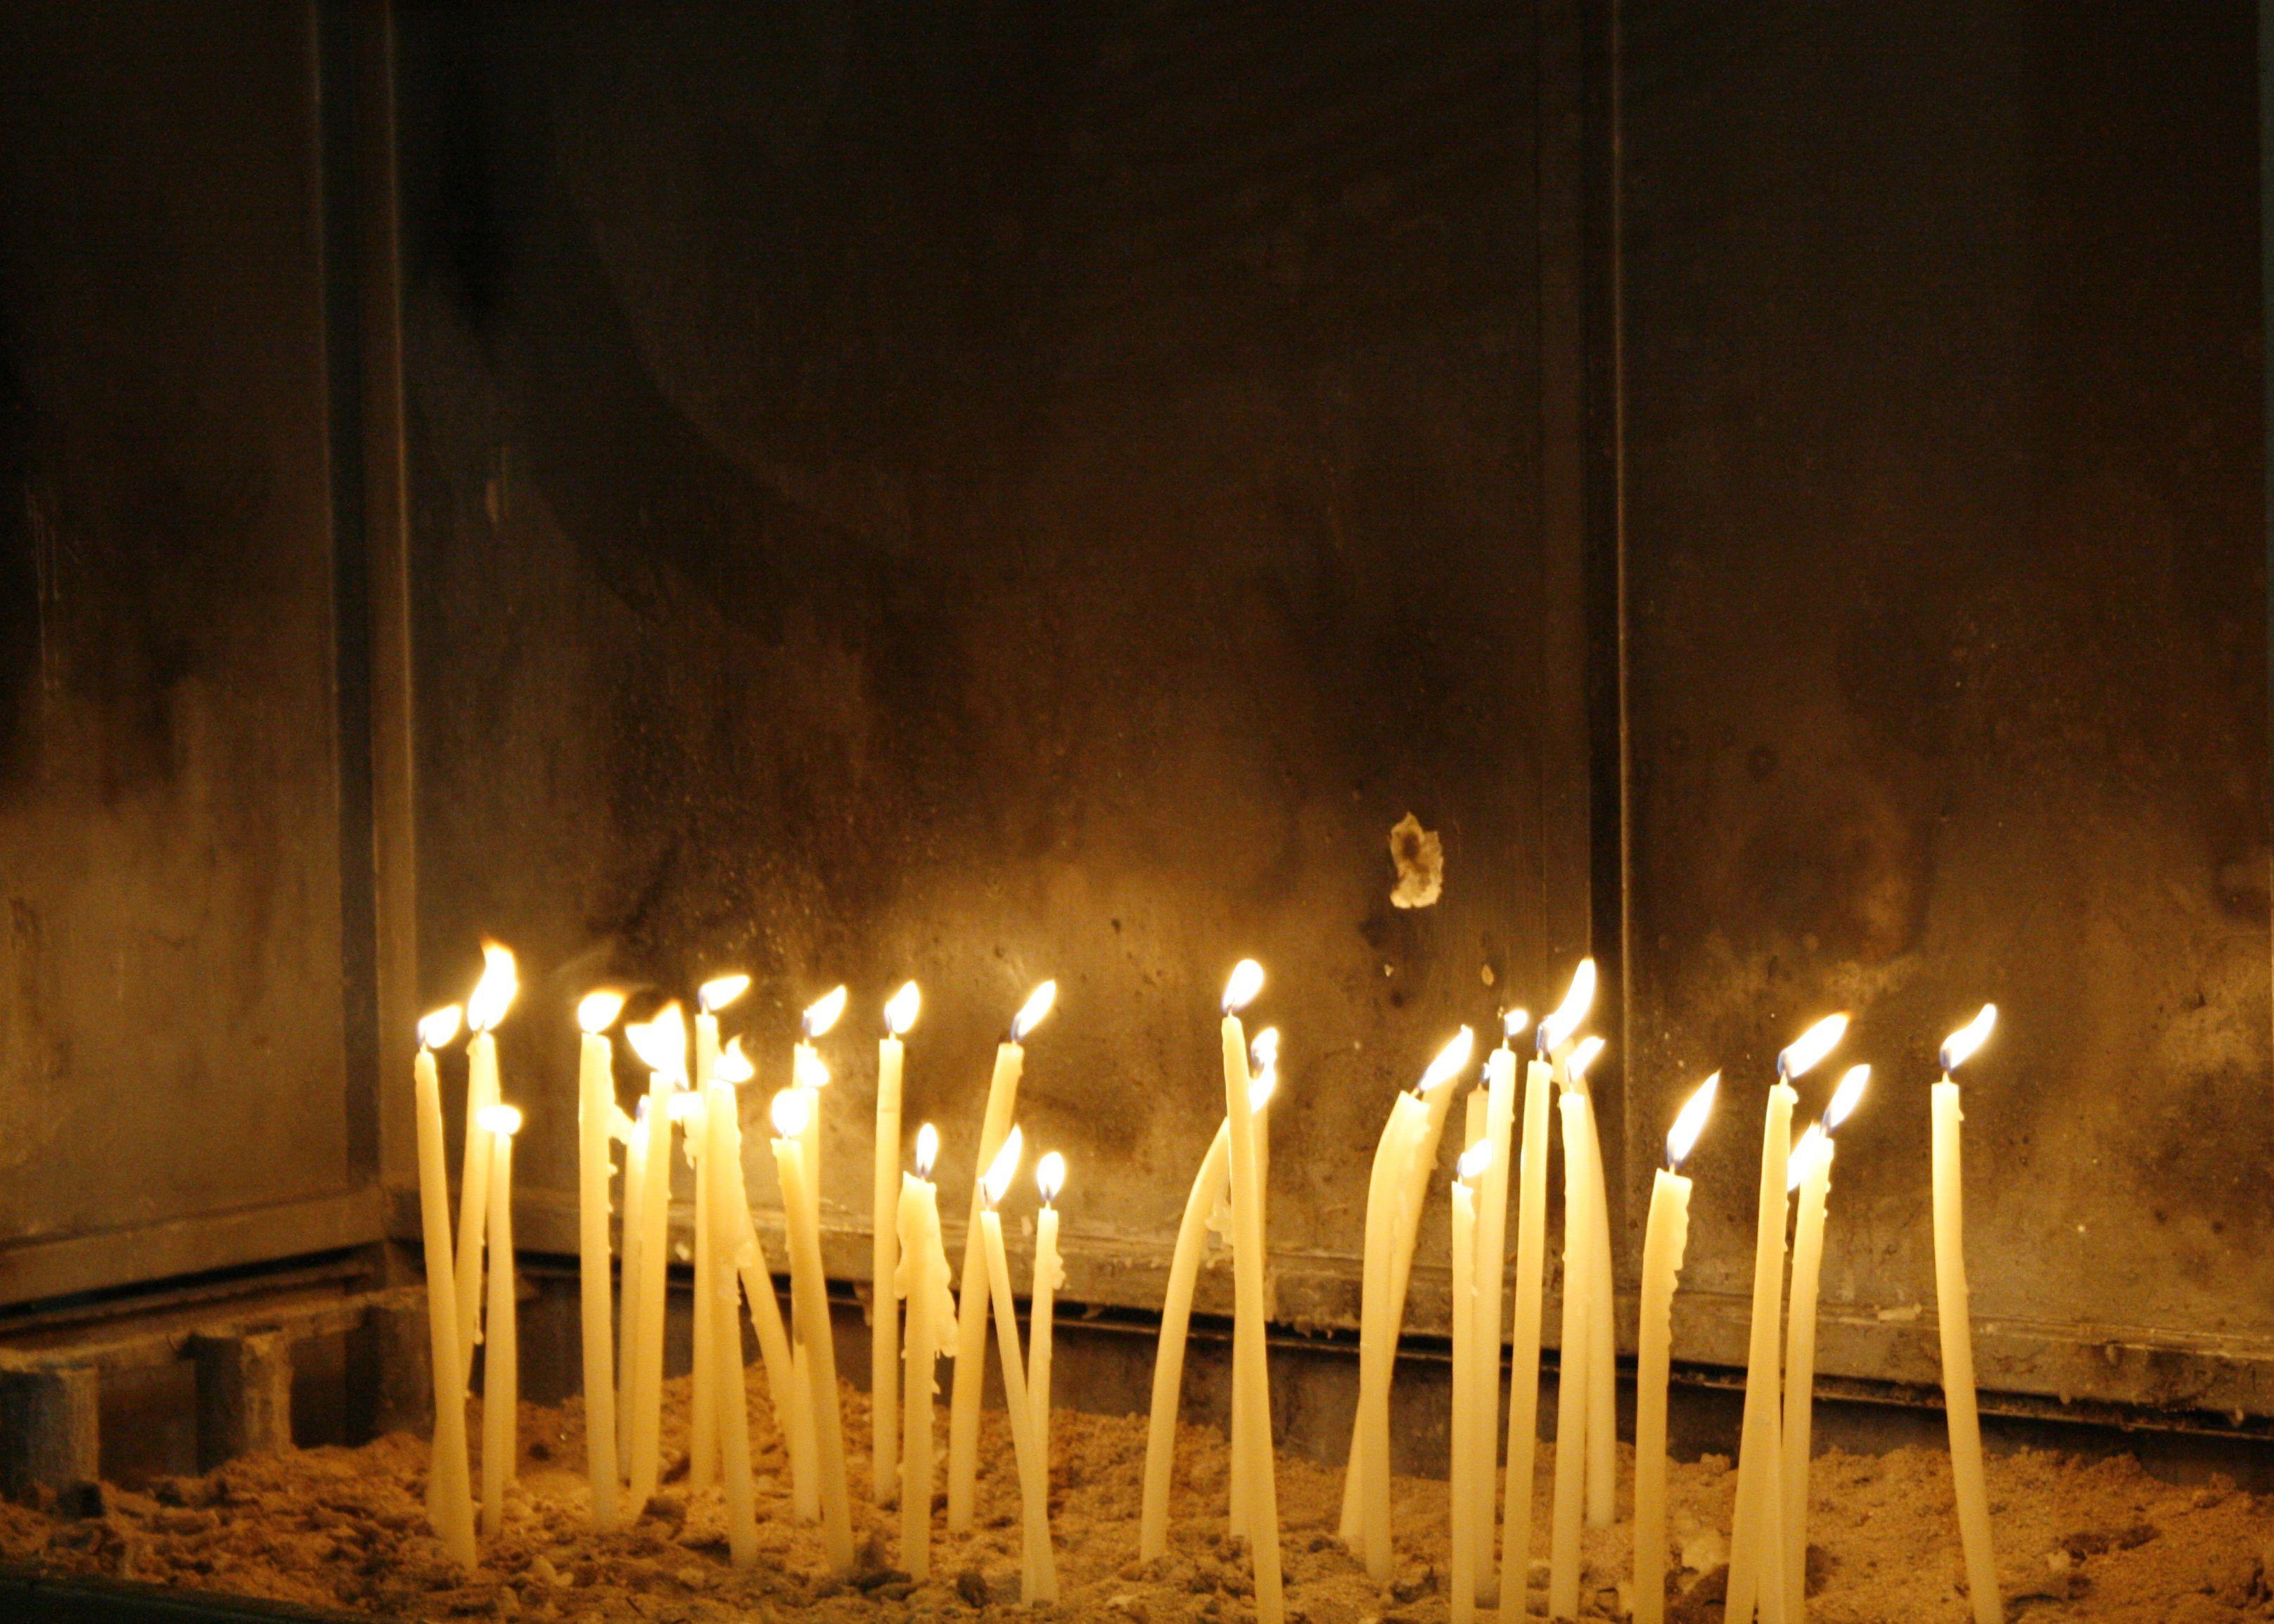 Lit candles, silent prayers  | Hellas (Greece) | Candles, Greece